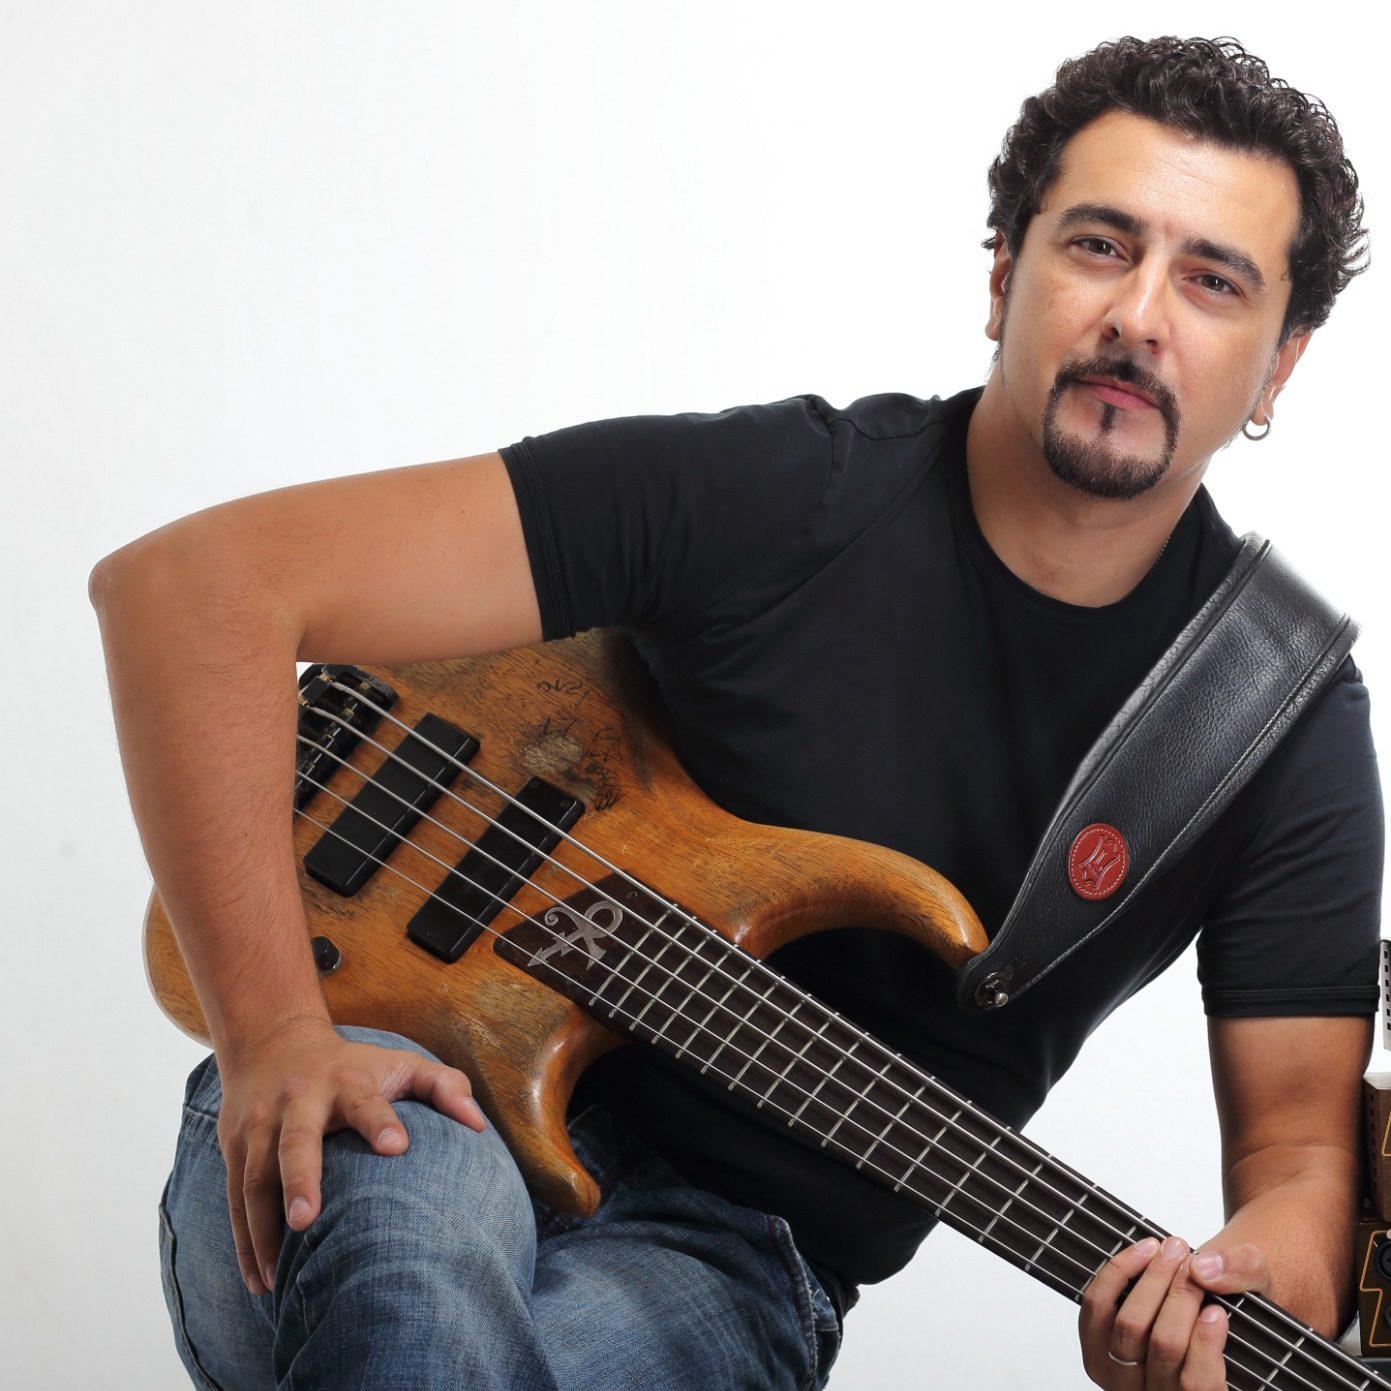 Mario Guarini